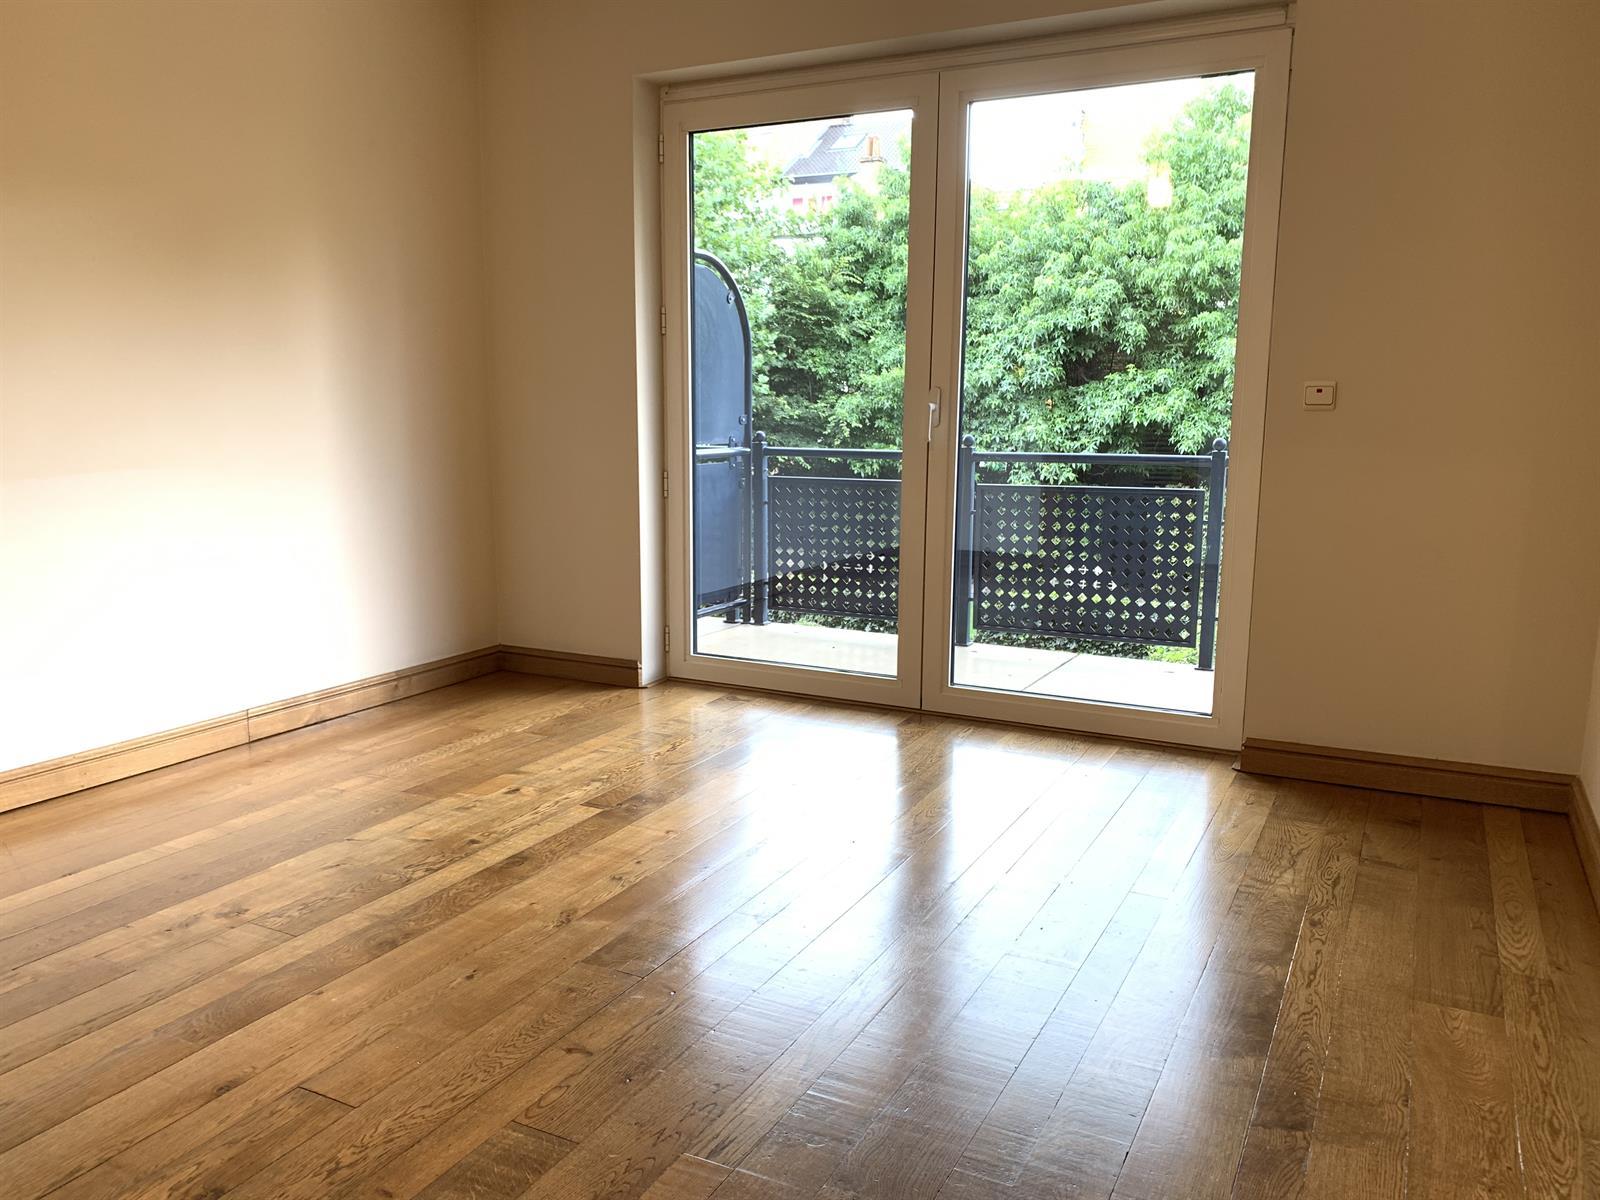 Appartement exceptionnel - Woluwe-Saint-Pierre - #4433539-27